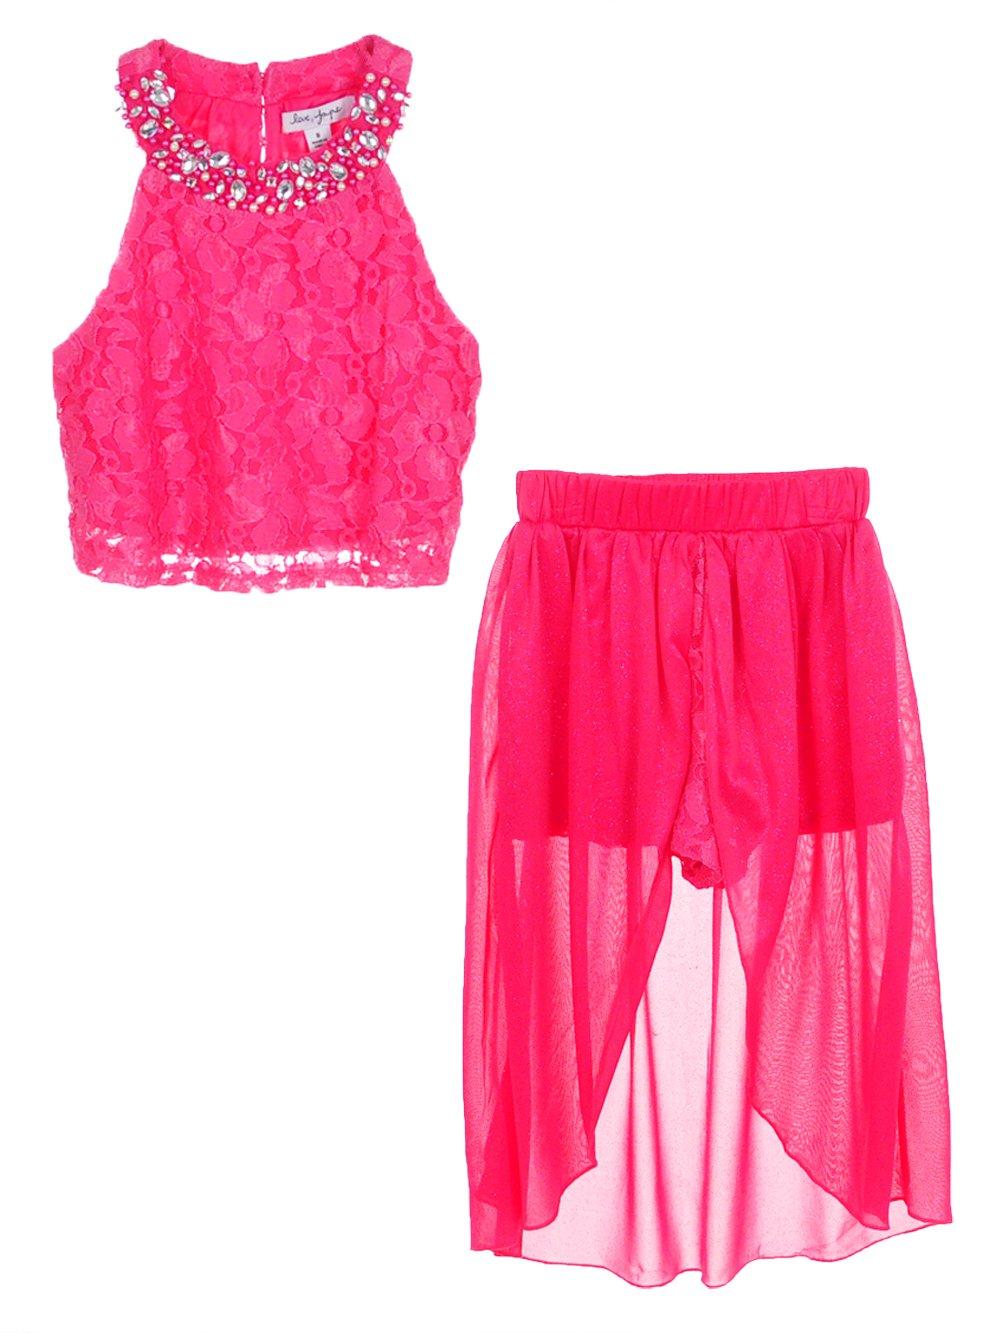 Love, Jayne Big Girls' 2-Piece Skirt Set Outfit - Fuchsia, 16